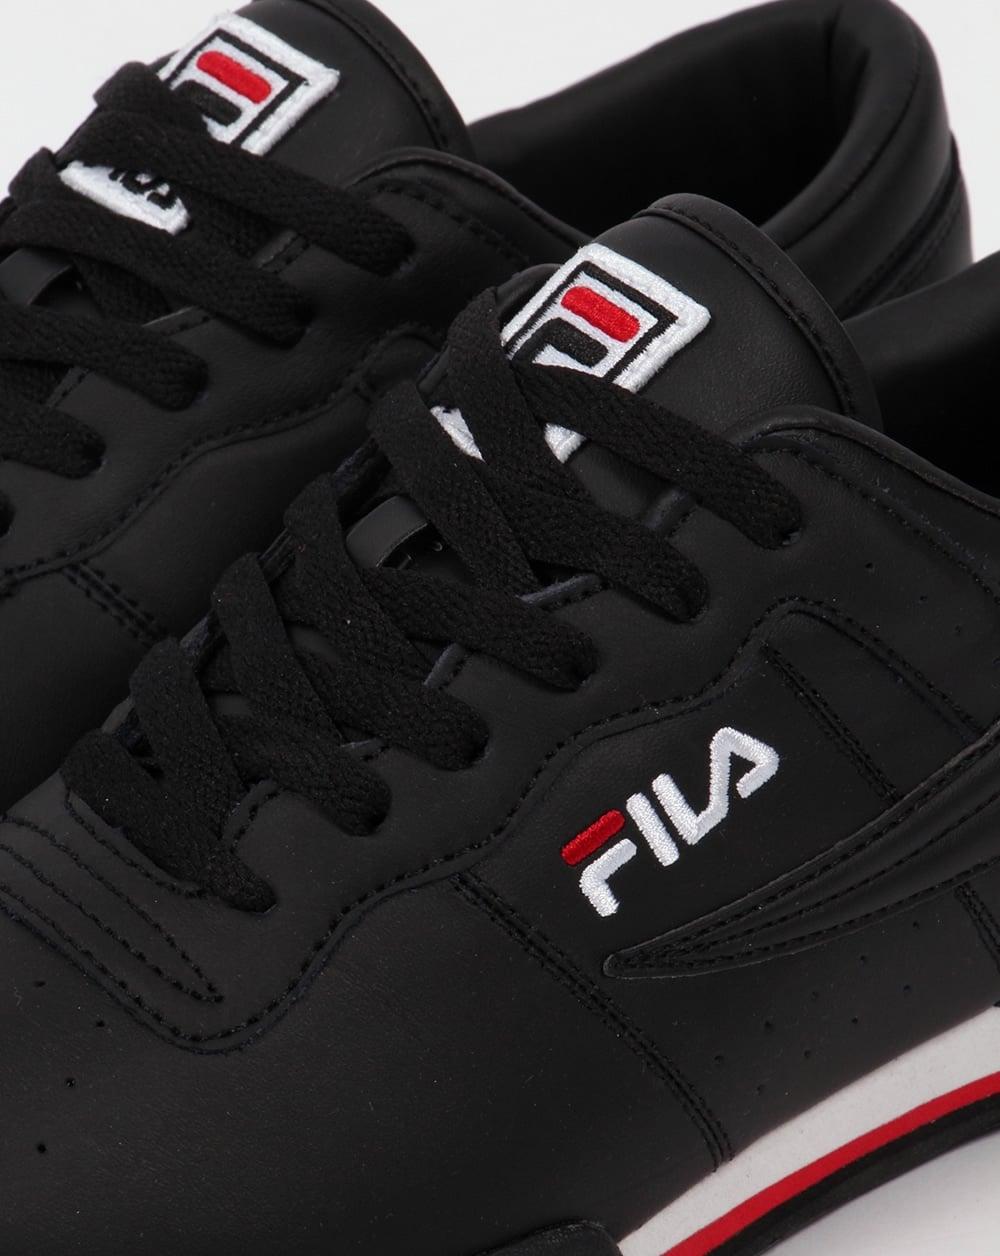 5c797ac187 Fila Vintage Original Fitness Trainers Black/White/Red